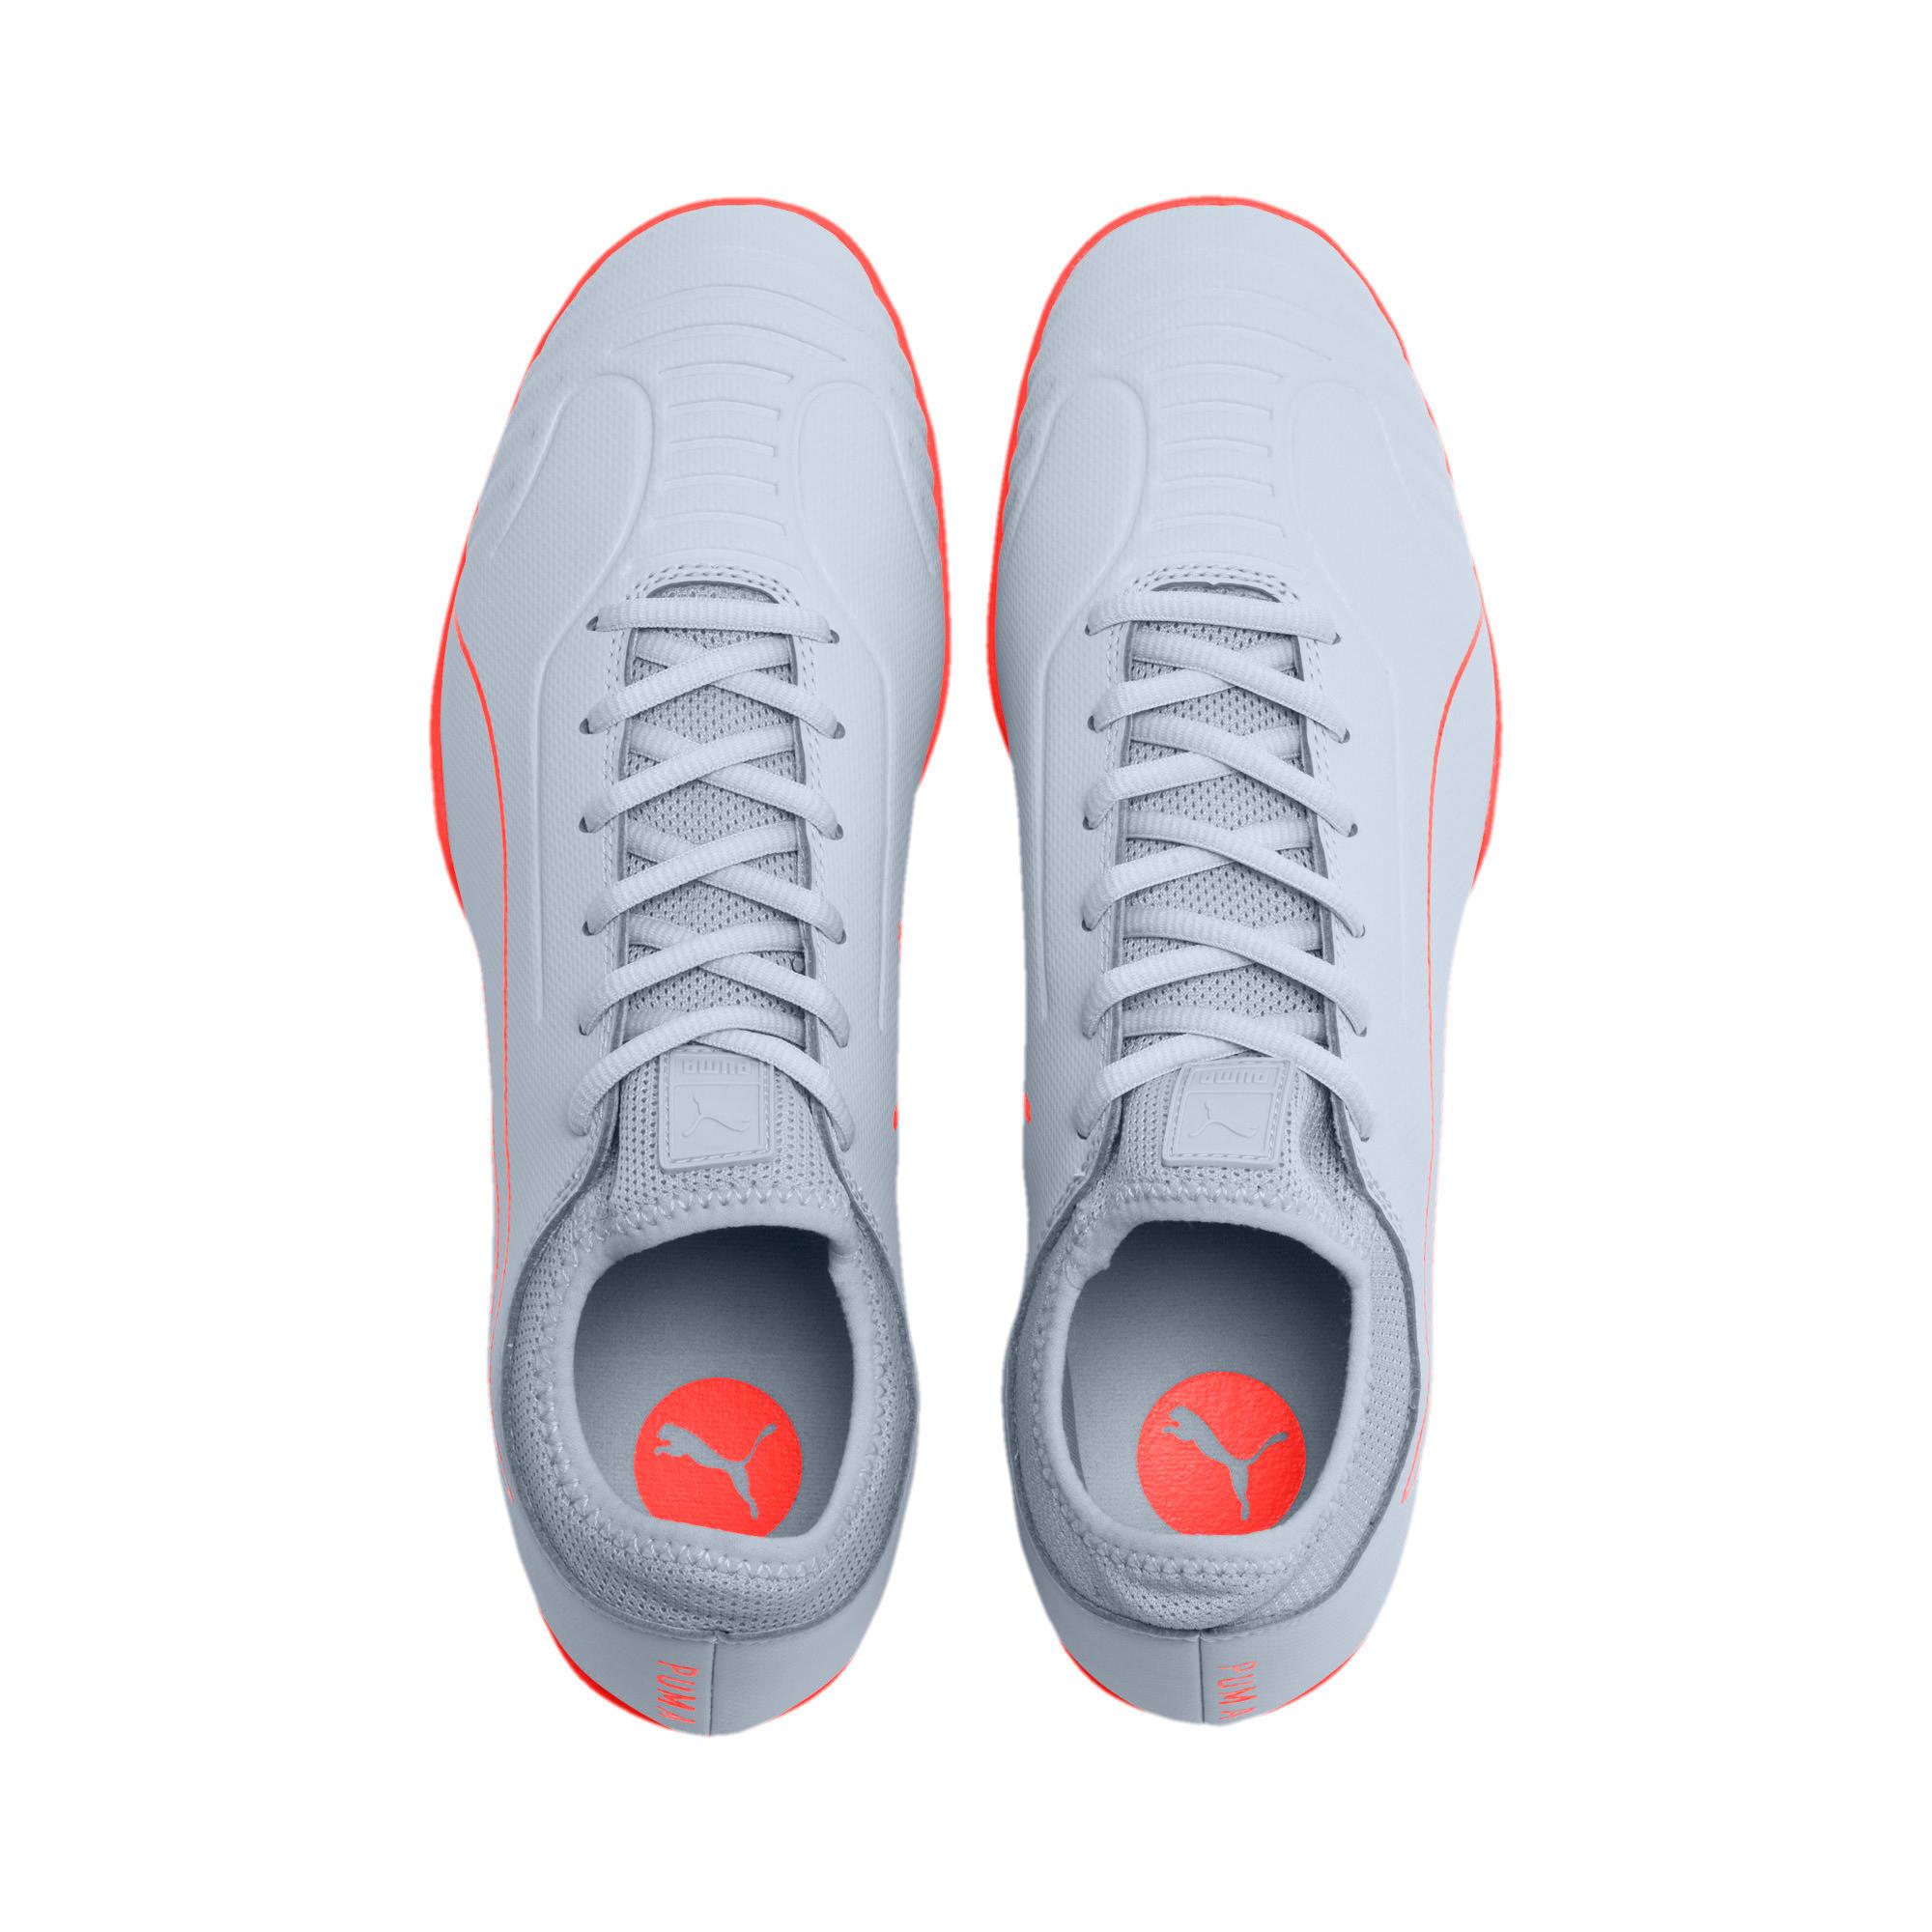 Thumbnail 7 of 365 Sala 2 Men's Soccer Shoes, Grey Dawn-Nrgy Red, medium